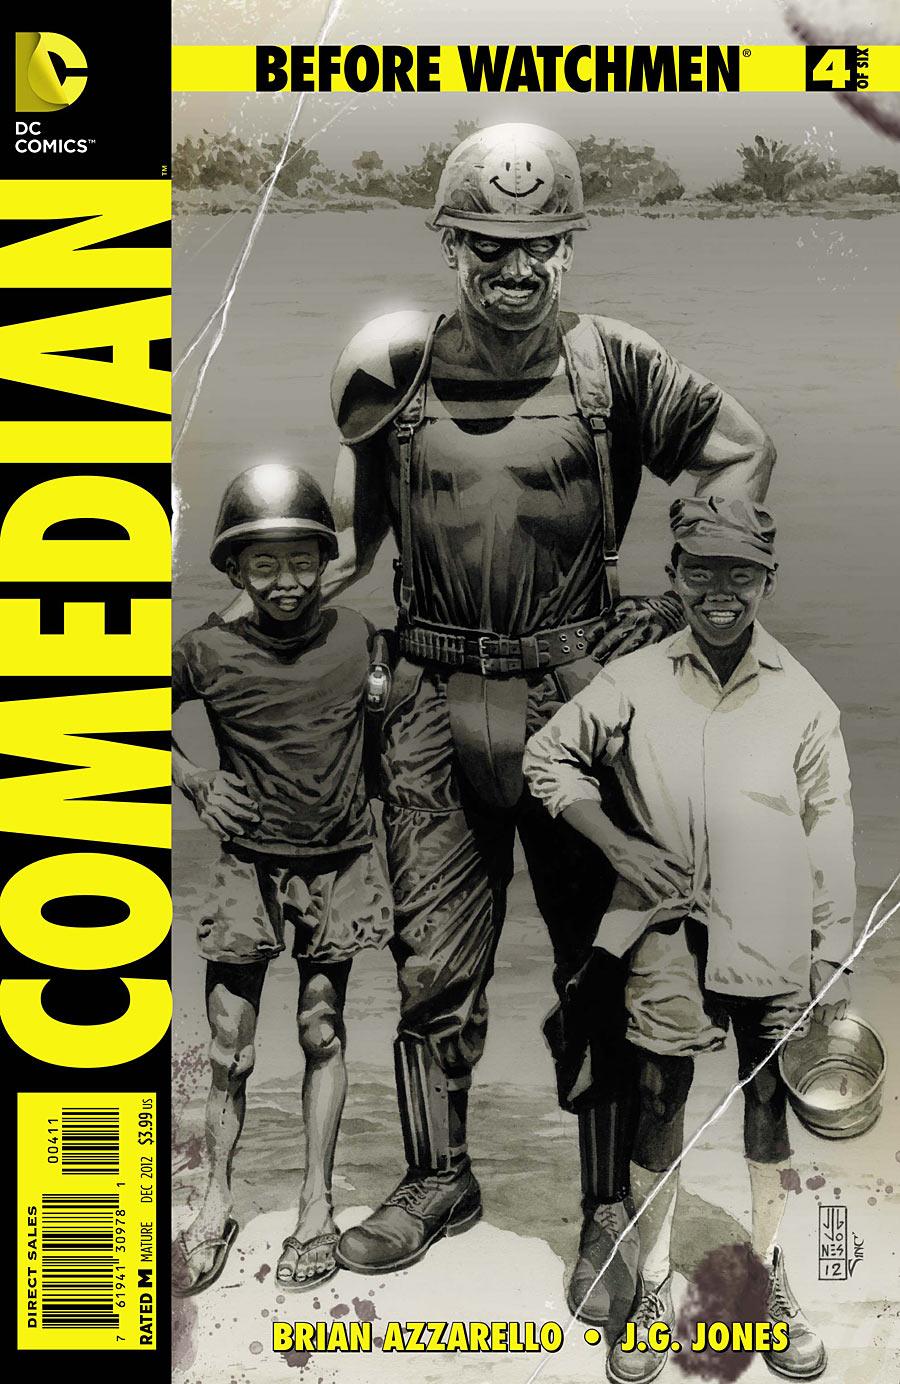 Before Watchmen Comedian 4 C Before Watchmen: Comedian #4 Review